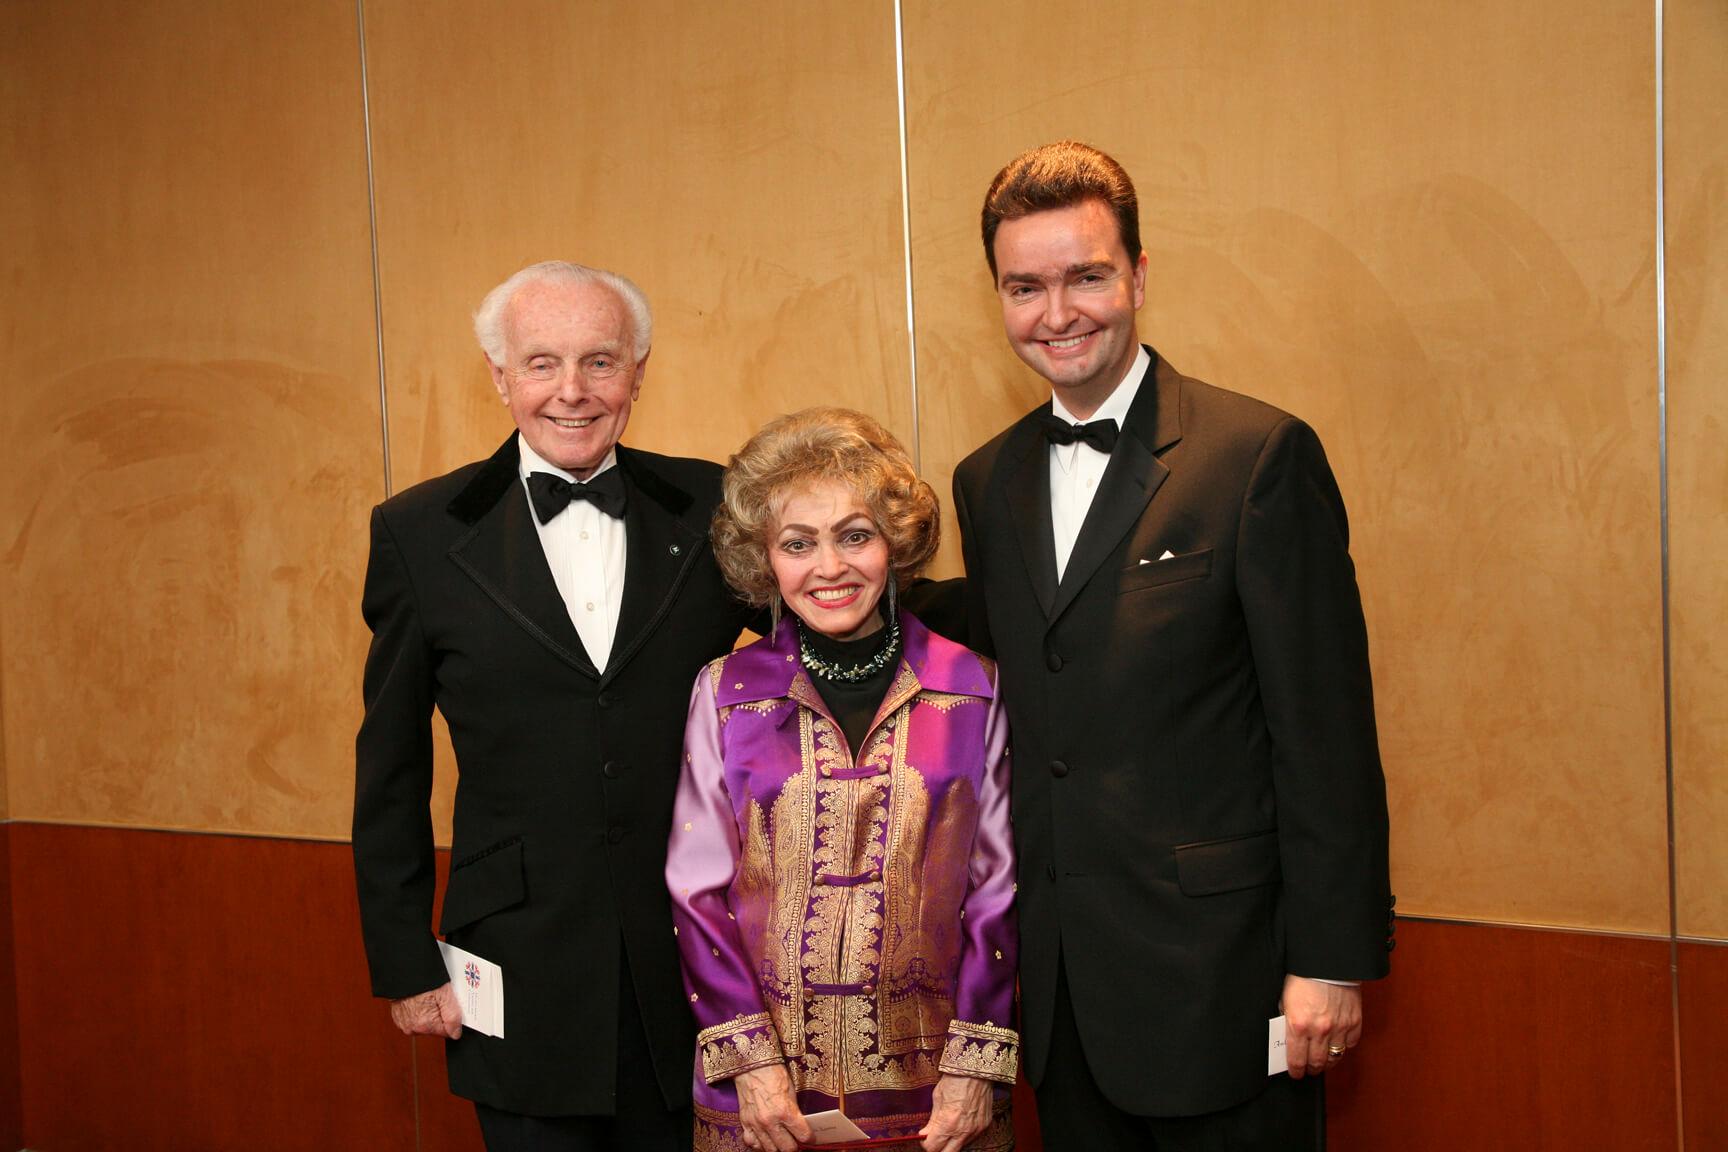 The Honorable Tom Lantos, Mrs. Anette Lantos, and Ambassador Georg von Habsburg